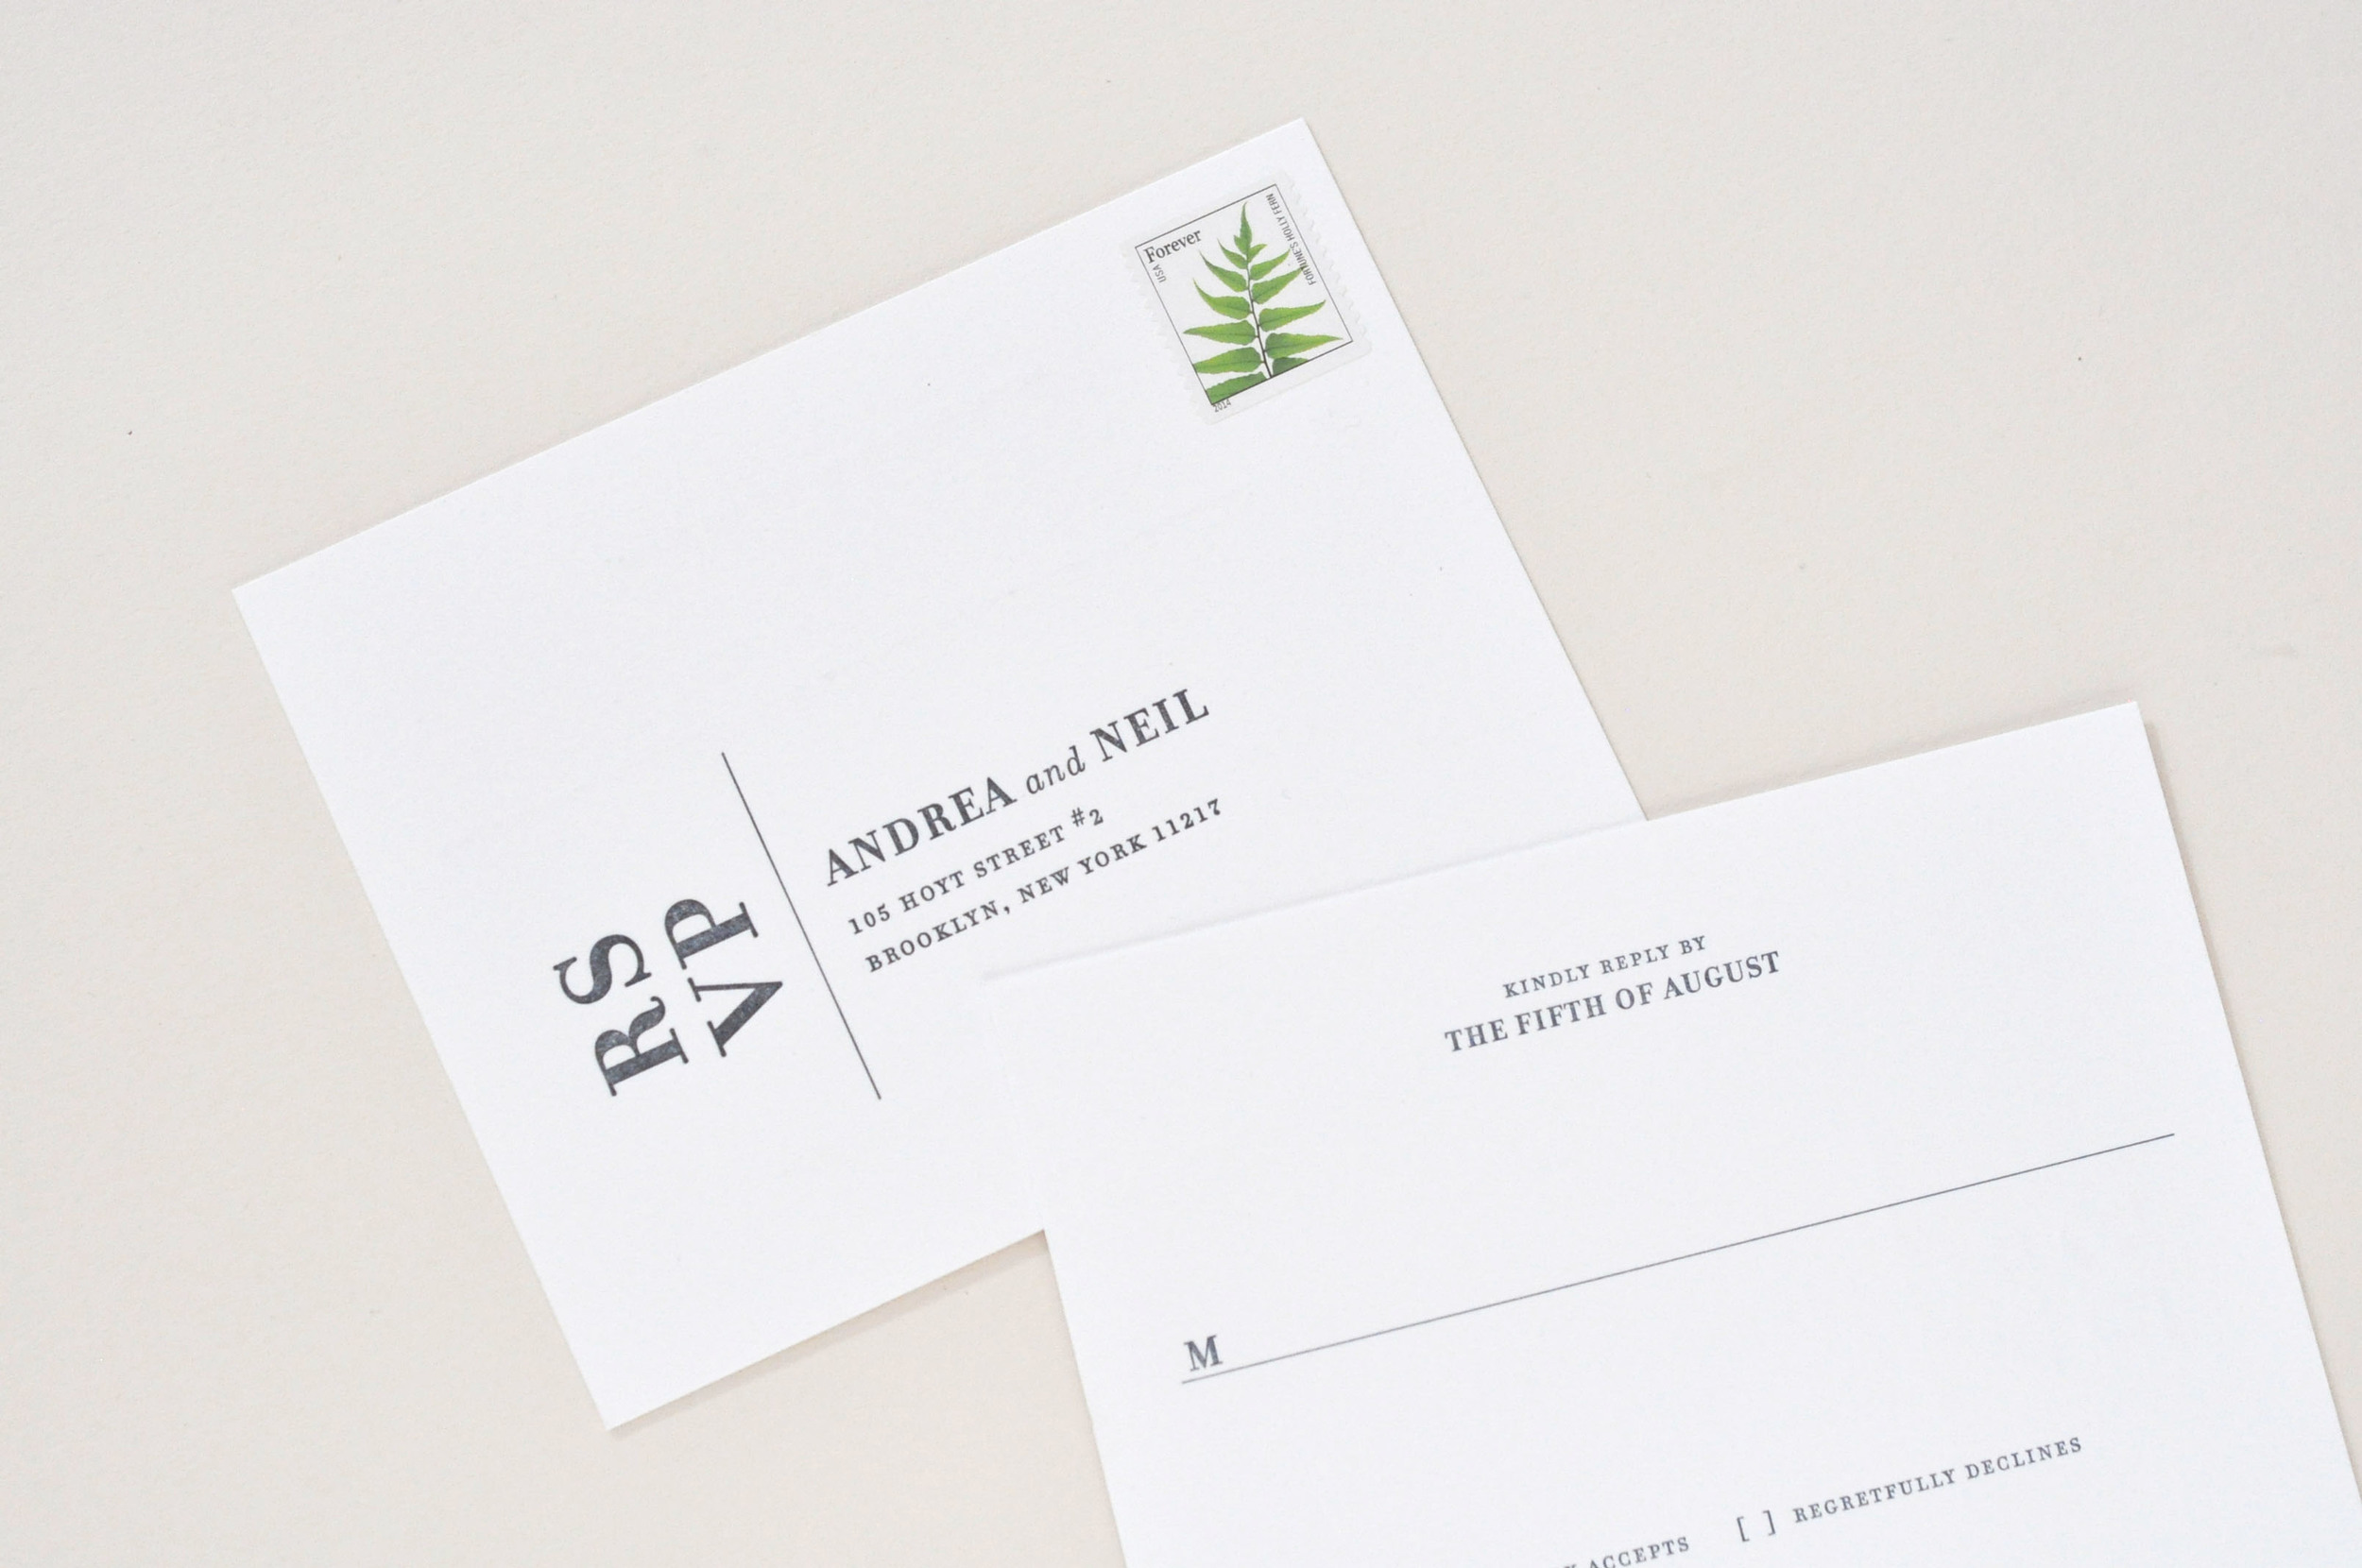 Andrea & Neil Wedding Invitation / Paper & Type.